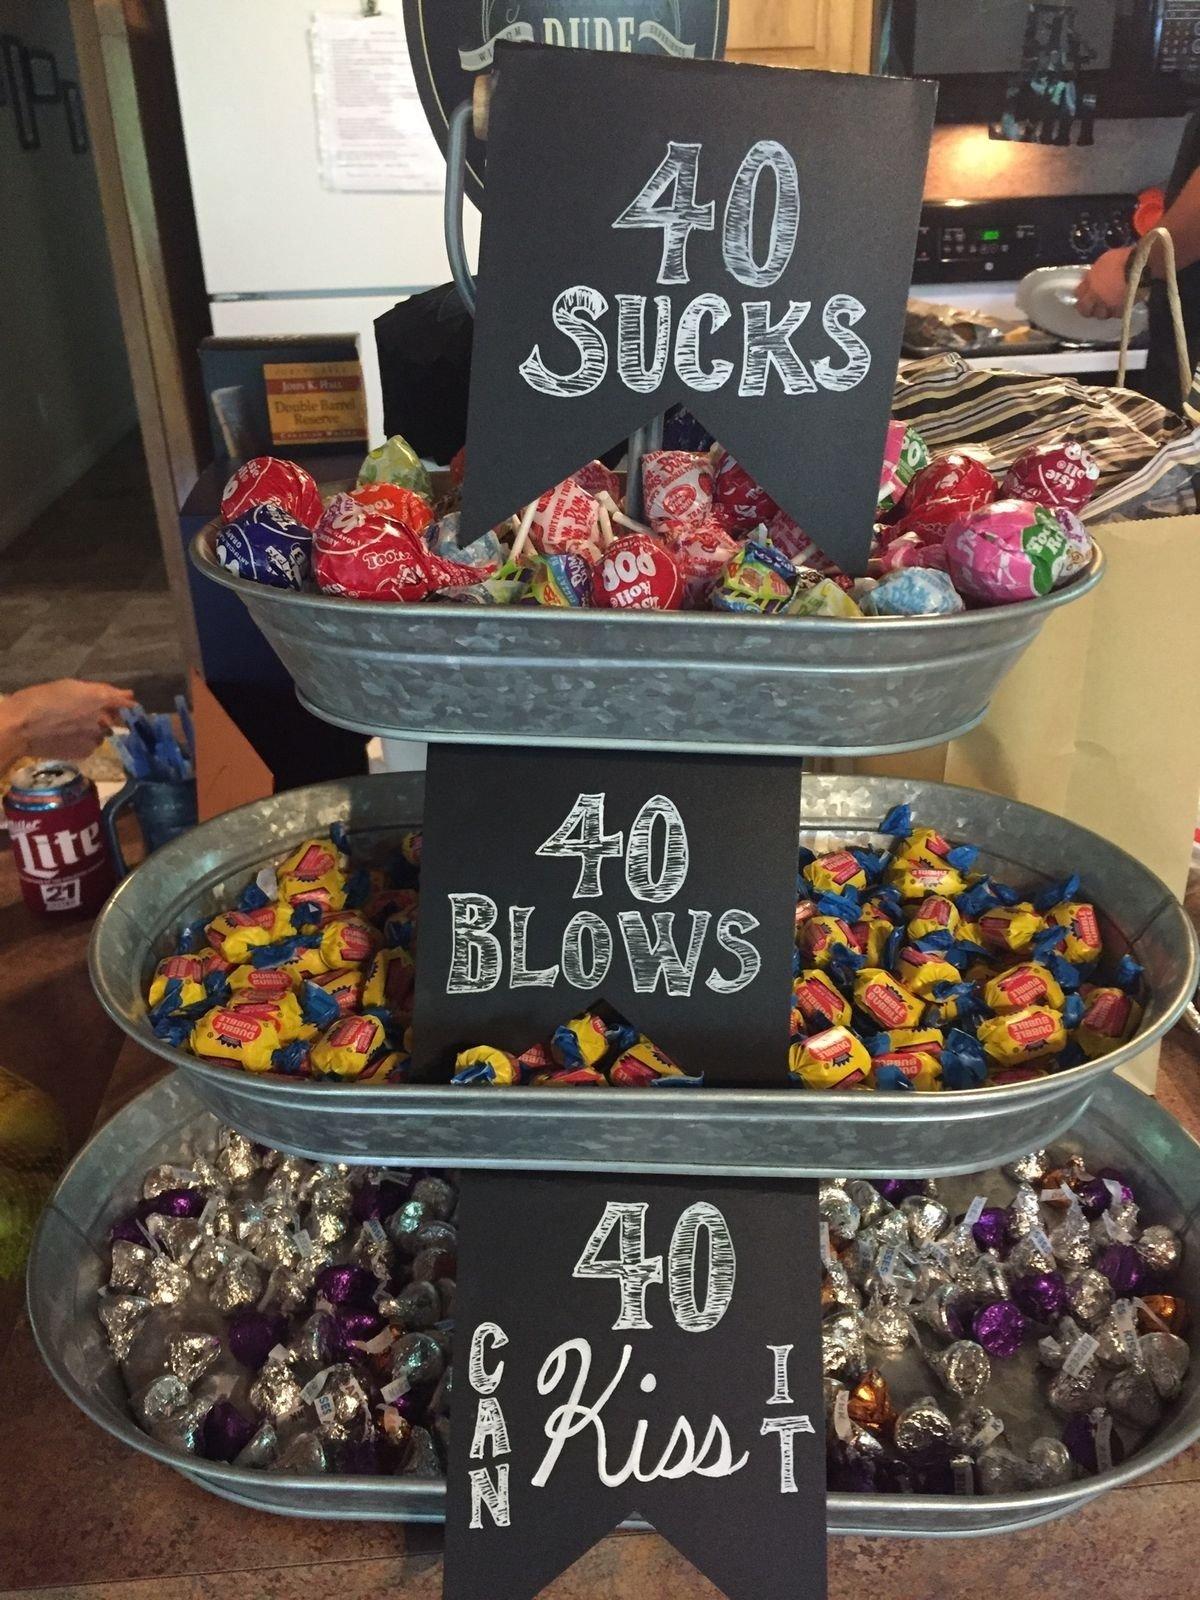 10 Nice Ideas For 40Th Birthday Celebration 40th birthday party ideas and games tags 40th birthday celebration 1 2020